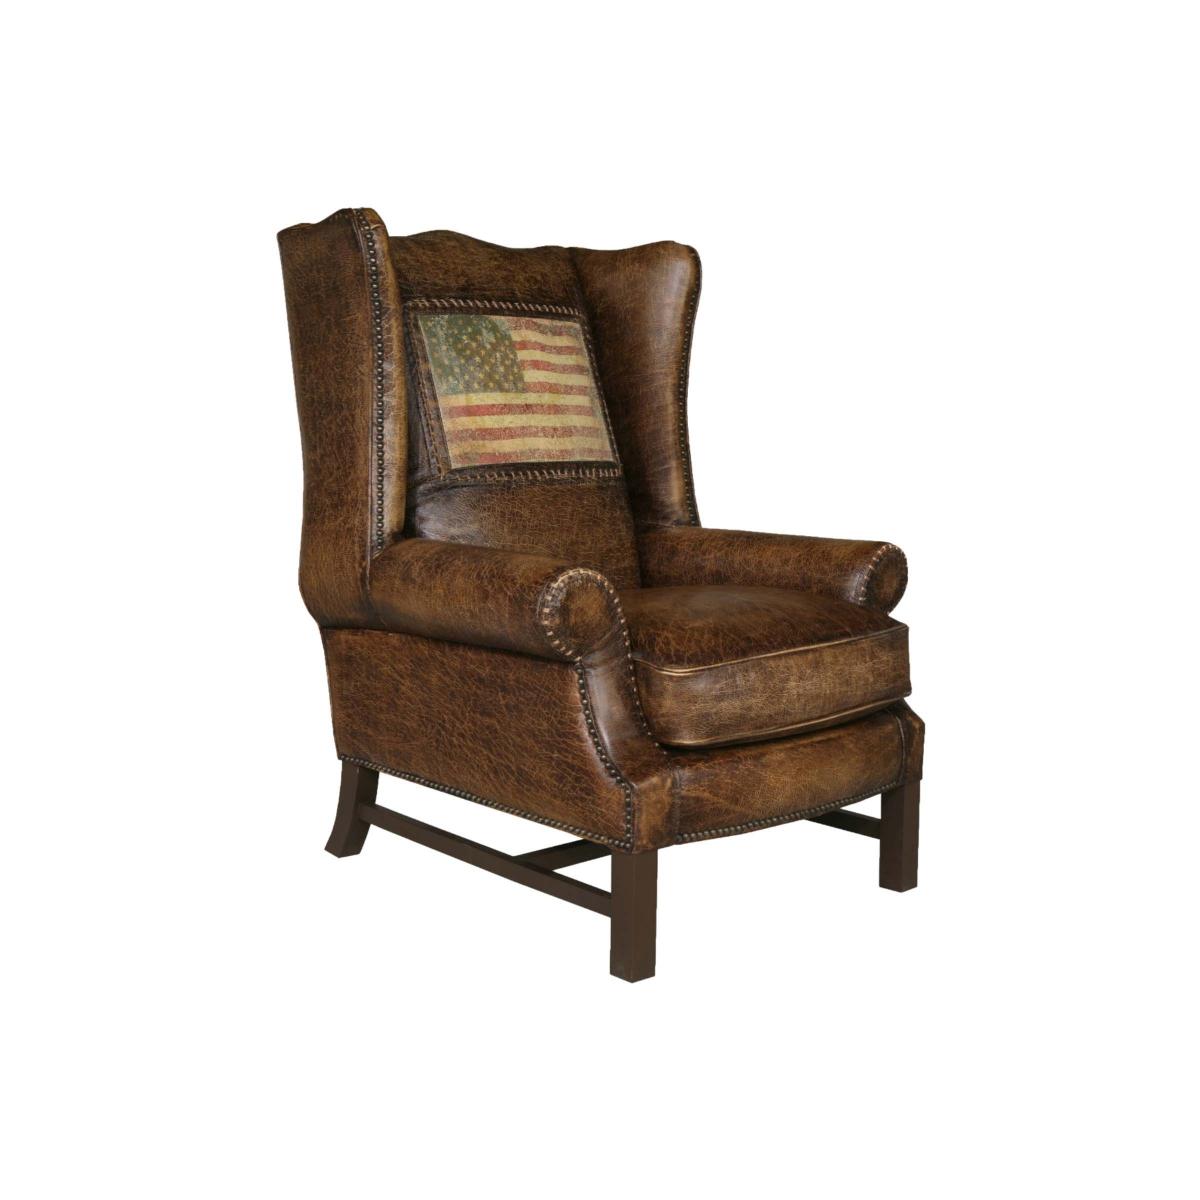 WASHINGTON - 1E Accent Chair Maestro Artisano Antique